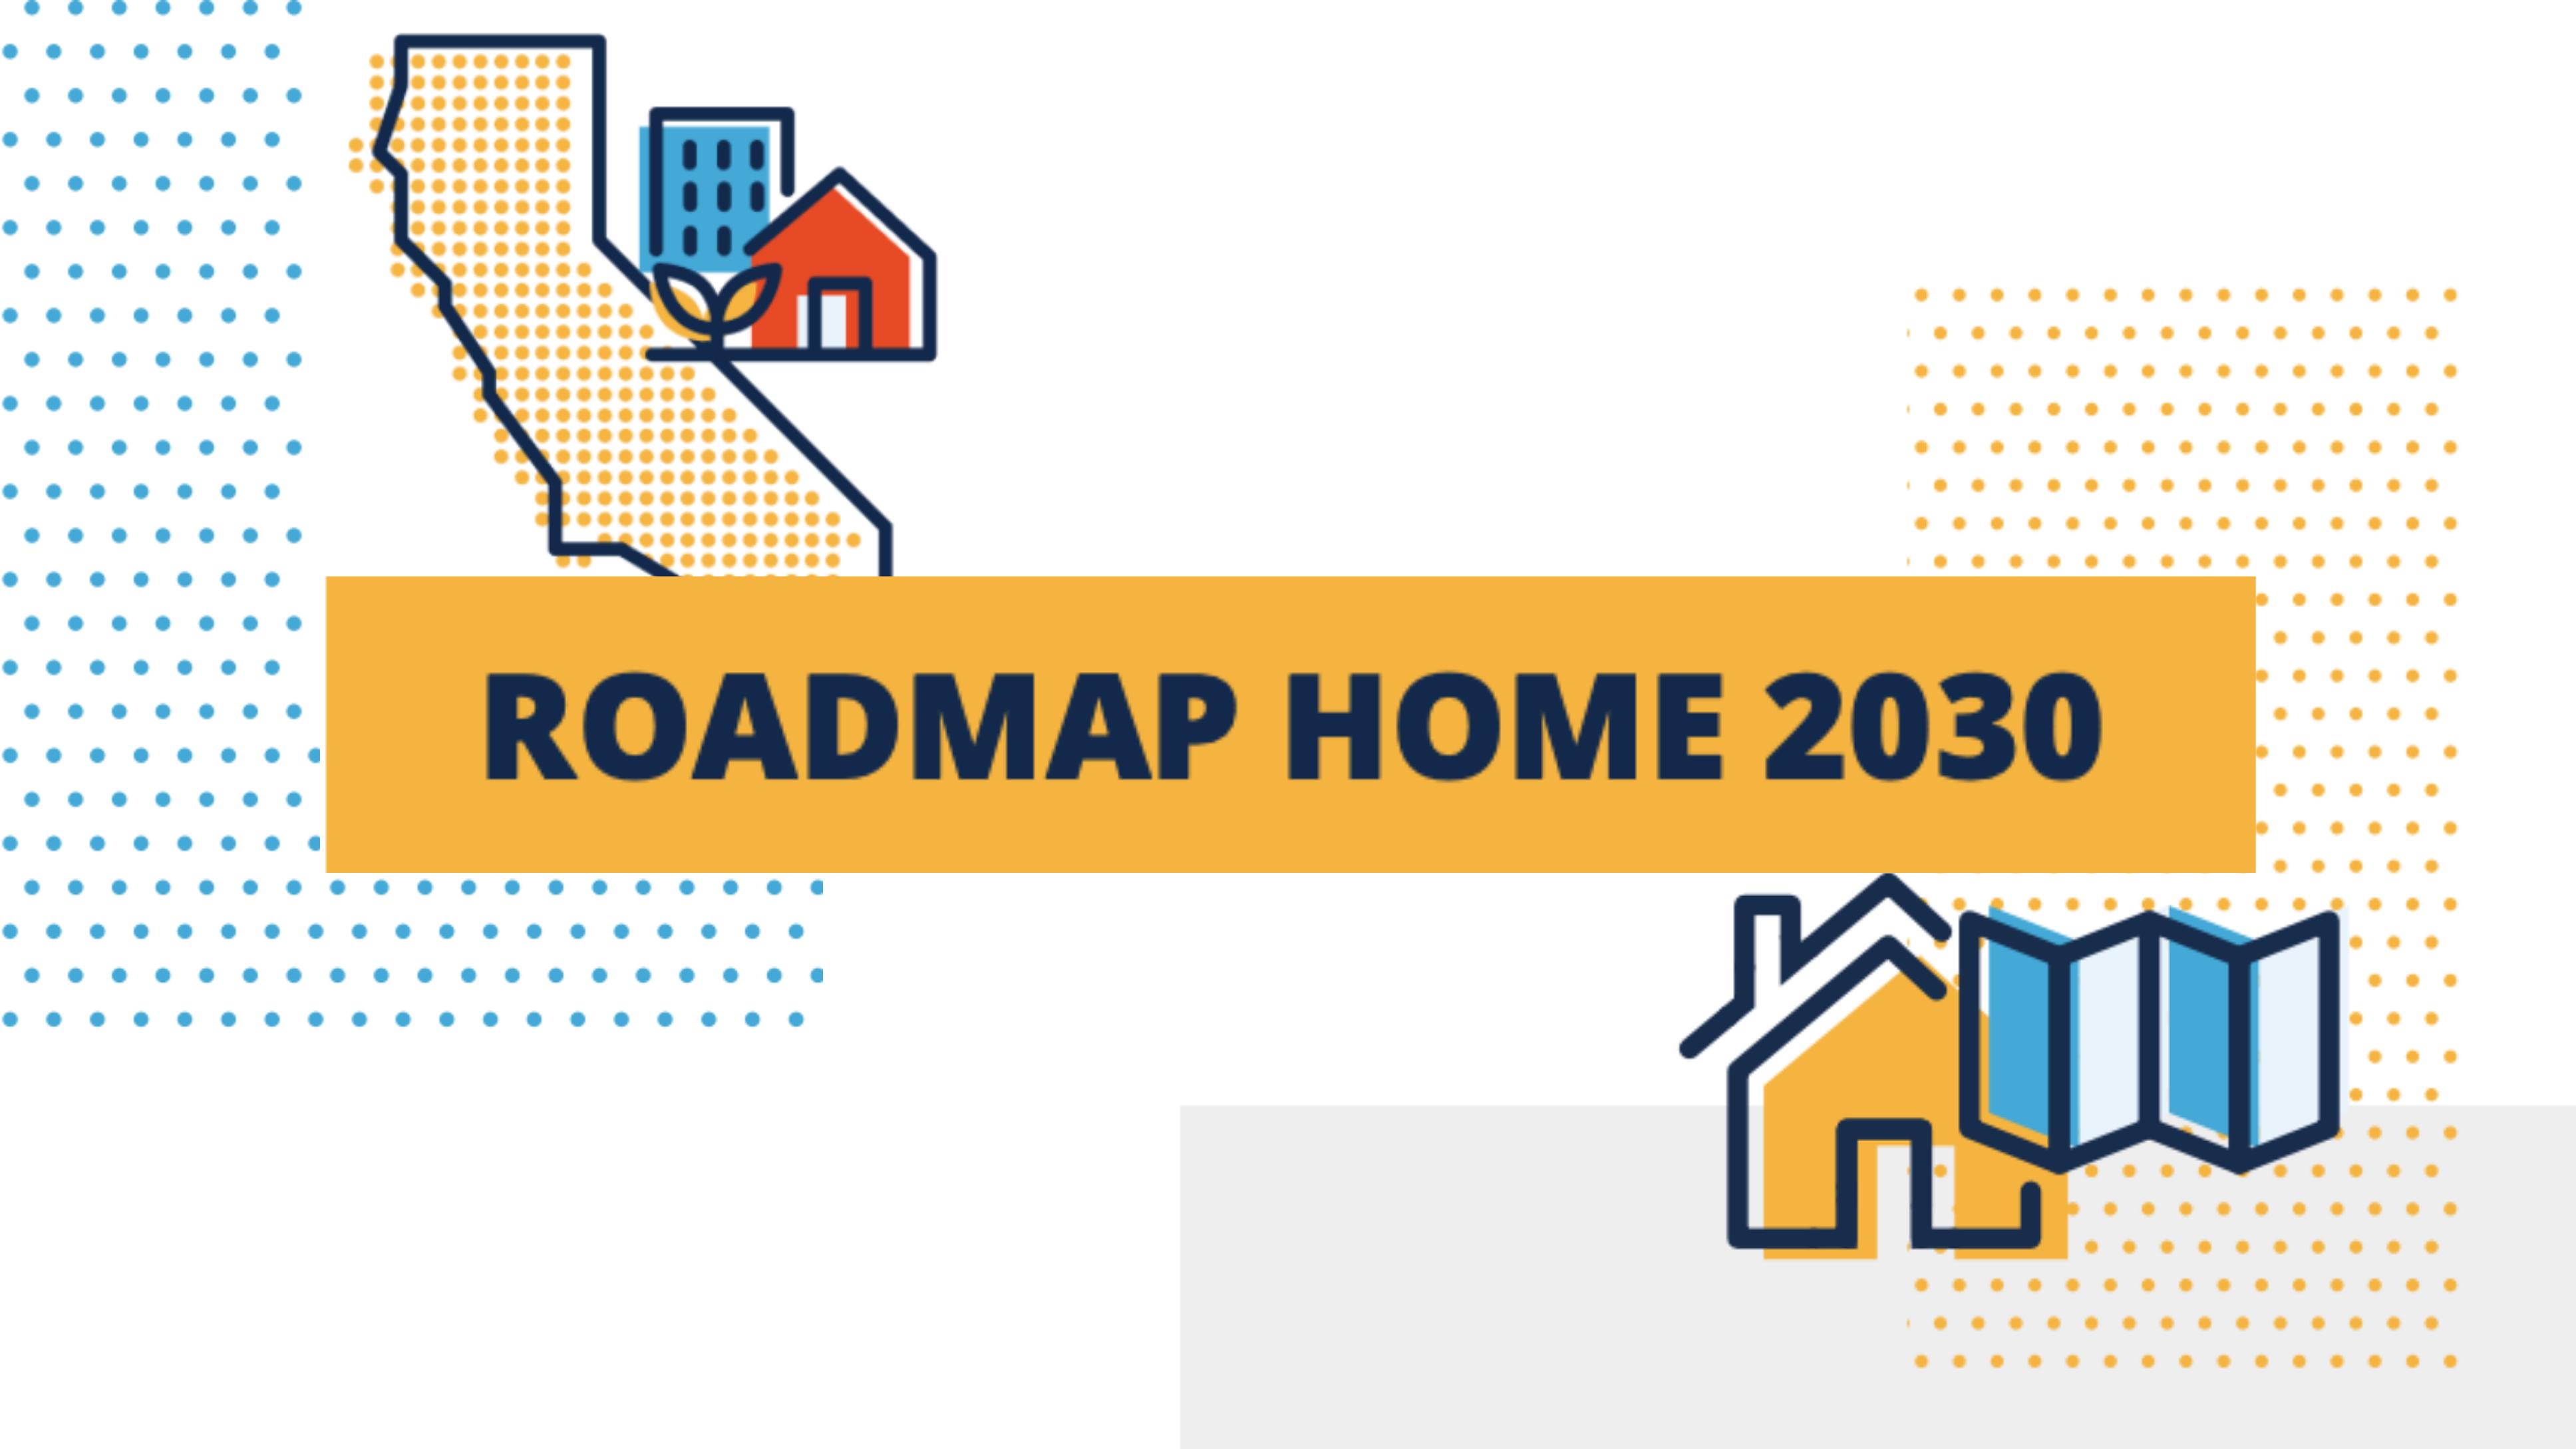 Roadmap Home 2030